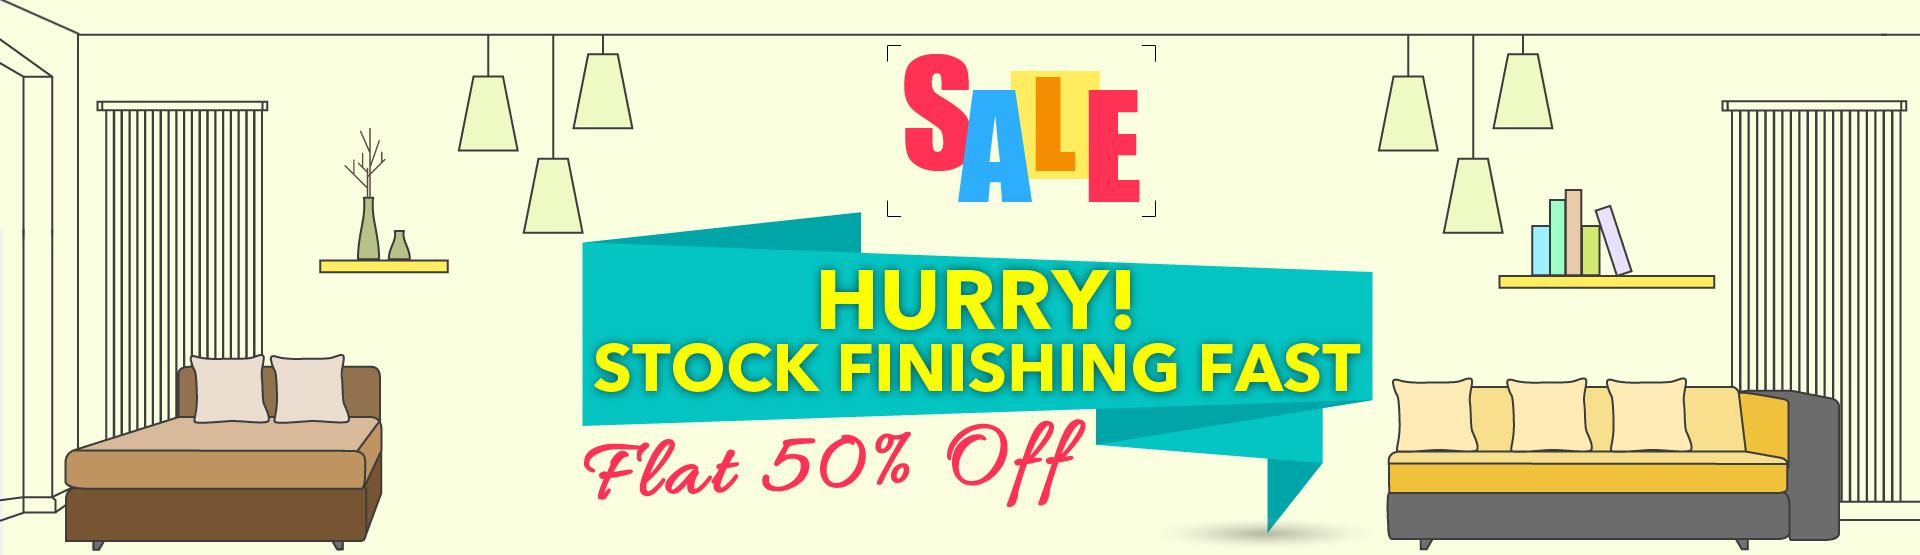 Housefull 50% Off Sale